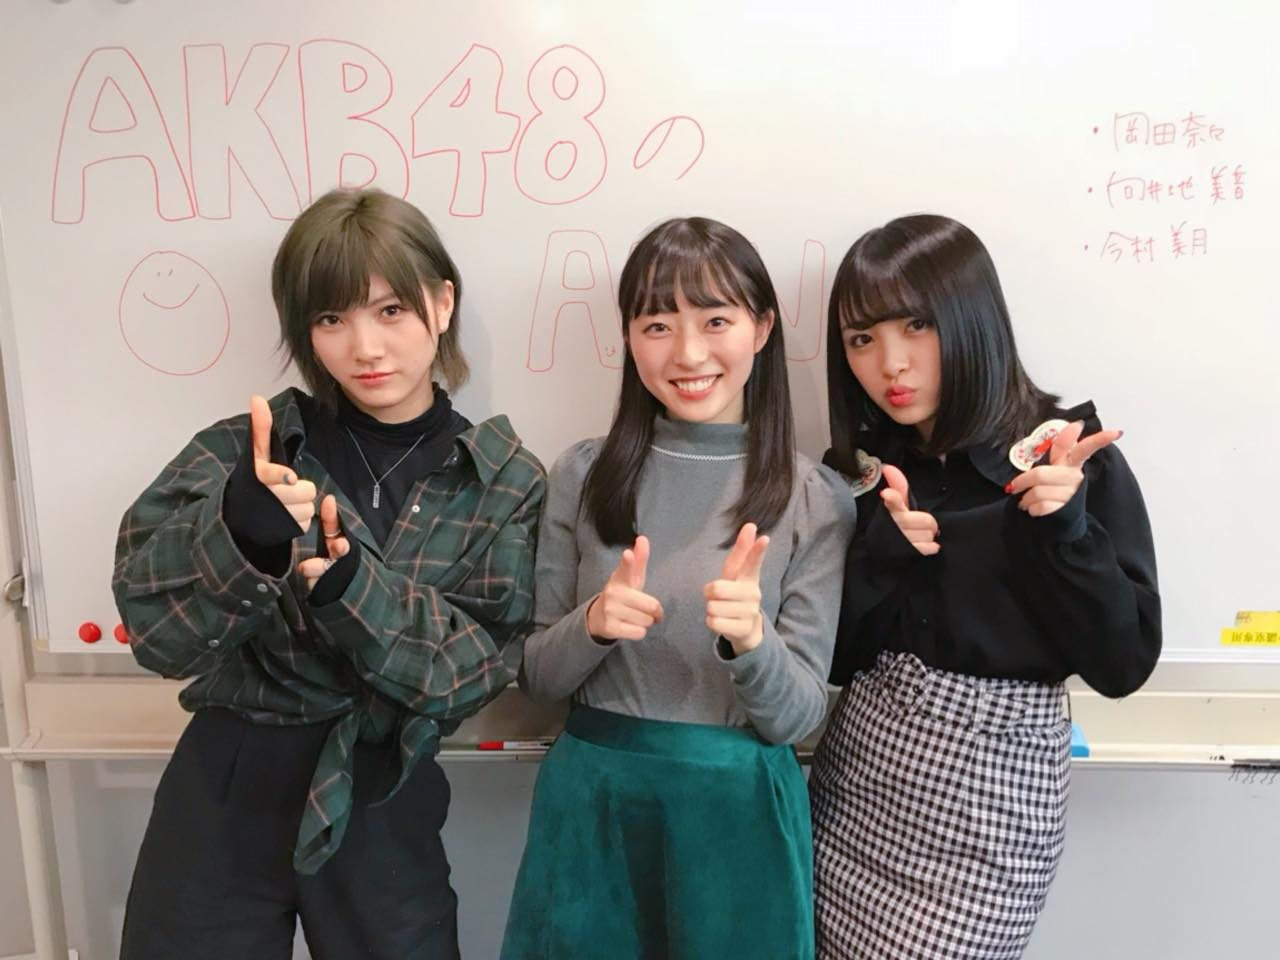 「AKB48のオールナイトニッポン」オフショット * 岡田奈々・向井地美音・今村美月